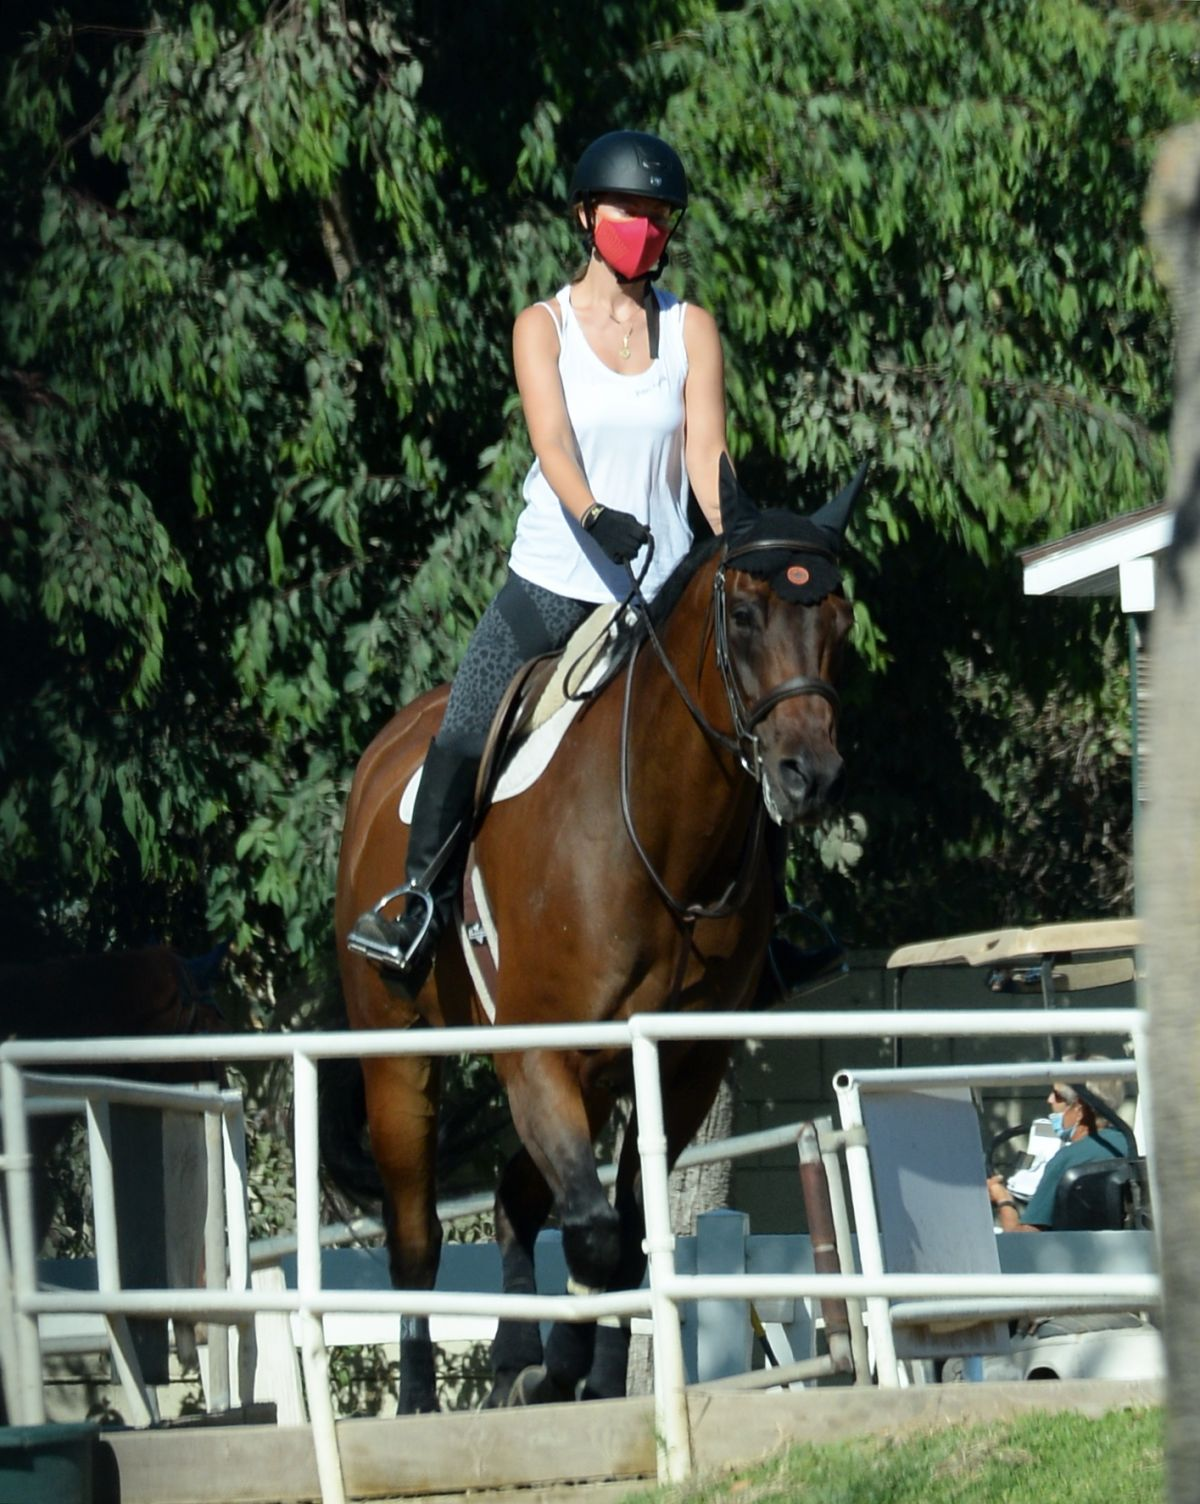 Olivia Wilde Riding Horse Thousand Oaks